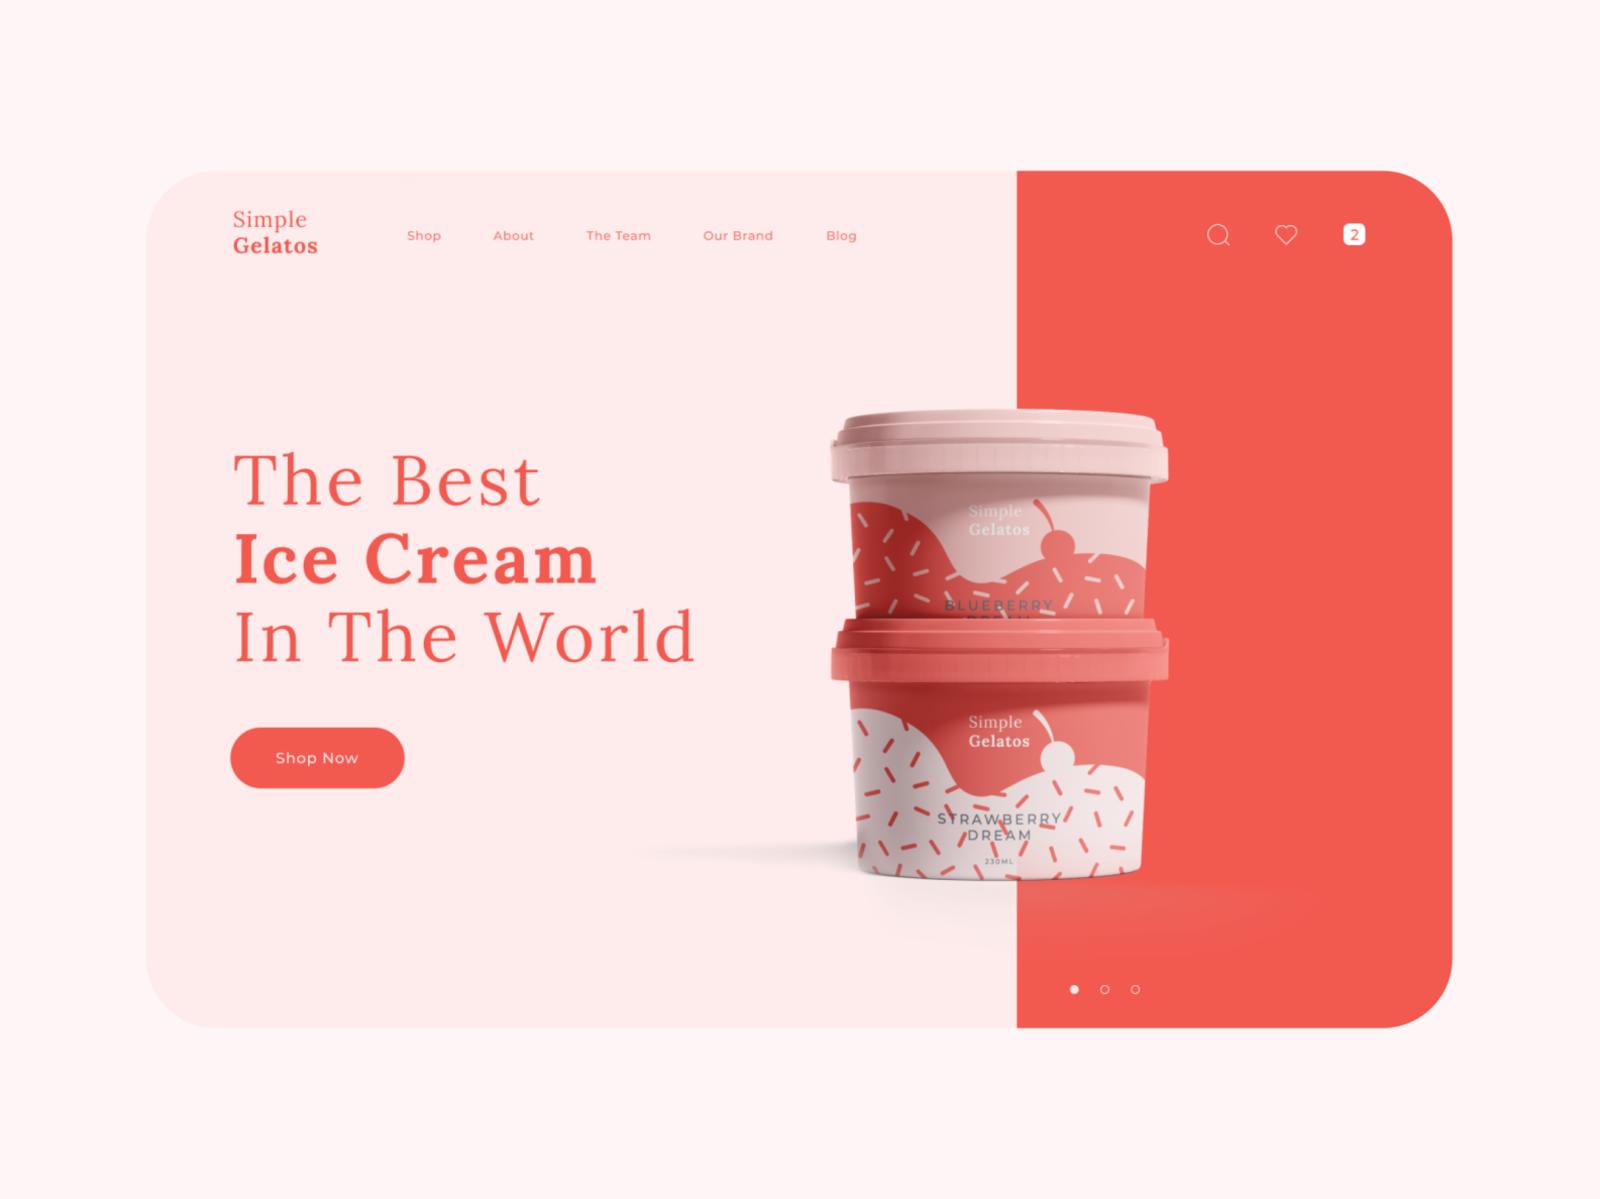 Example of using pink in web design (source: Bruno Vasconcelos)